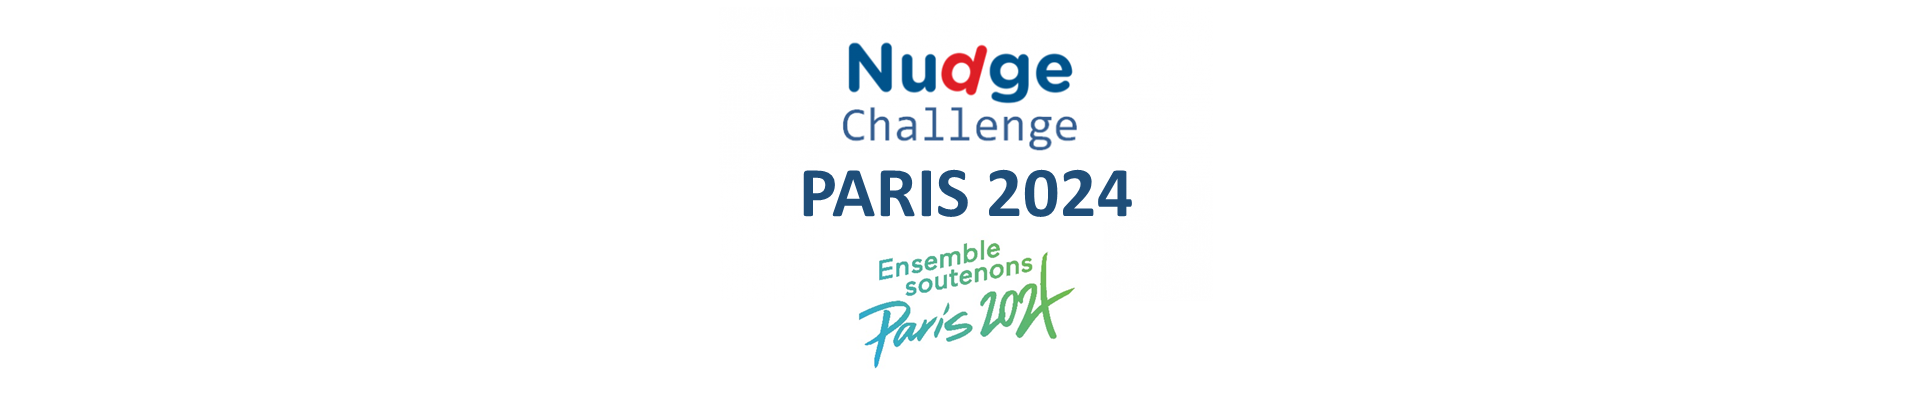 Challenge-Paris-20241